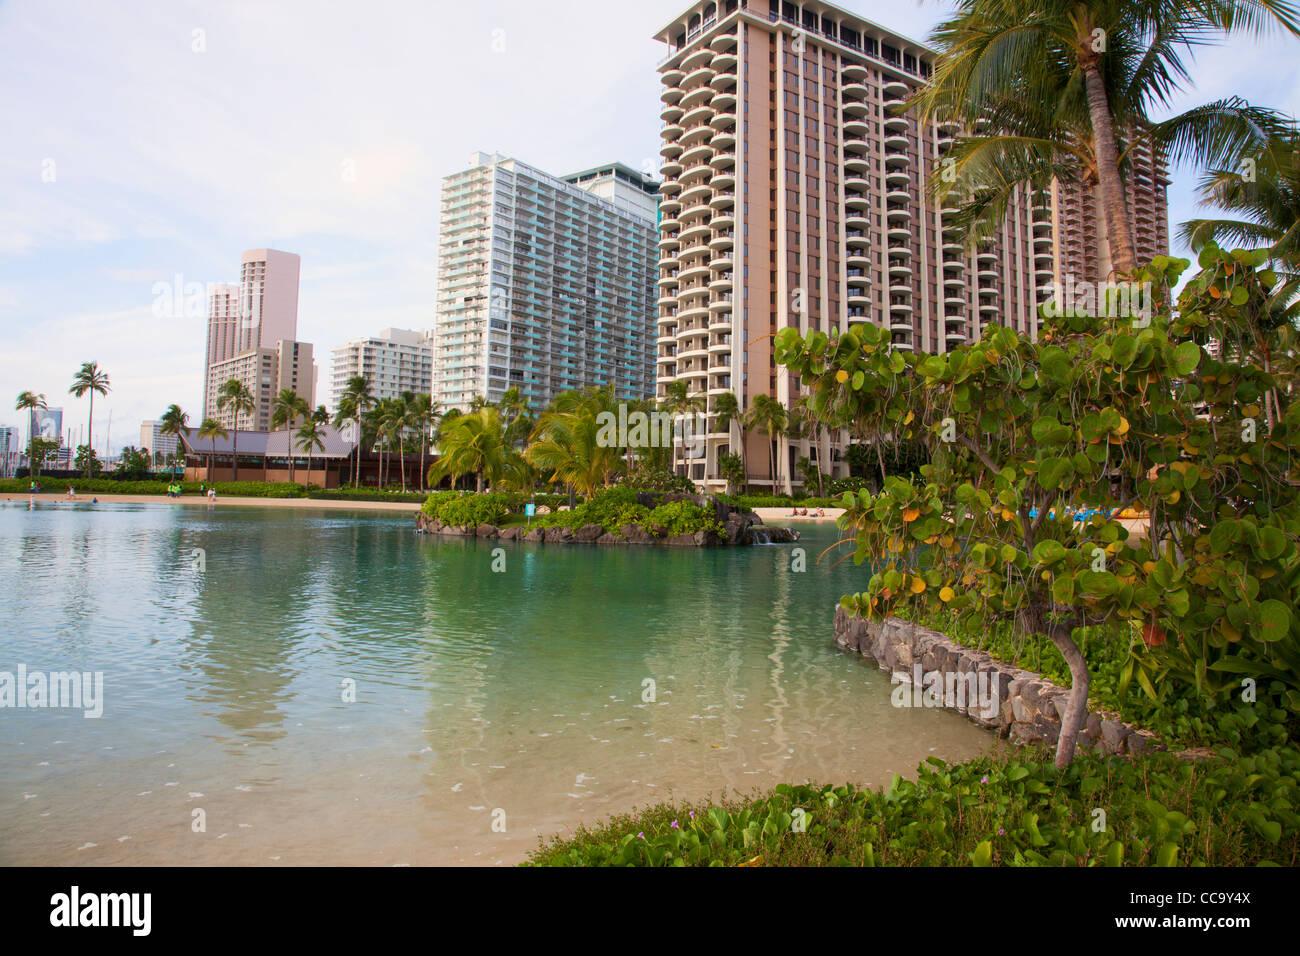 Hilton Hawaiian Village, Waikiki, Honolulu, Hawaii. - Stock Image